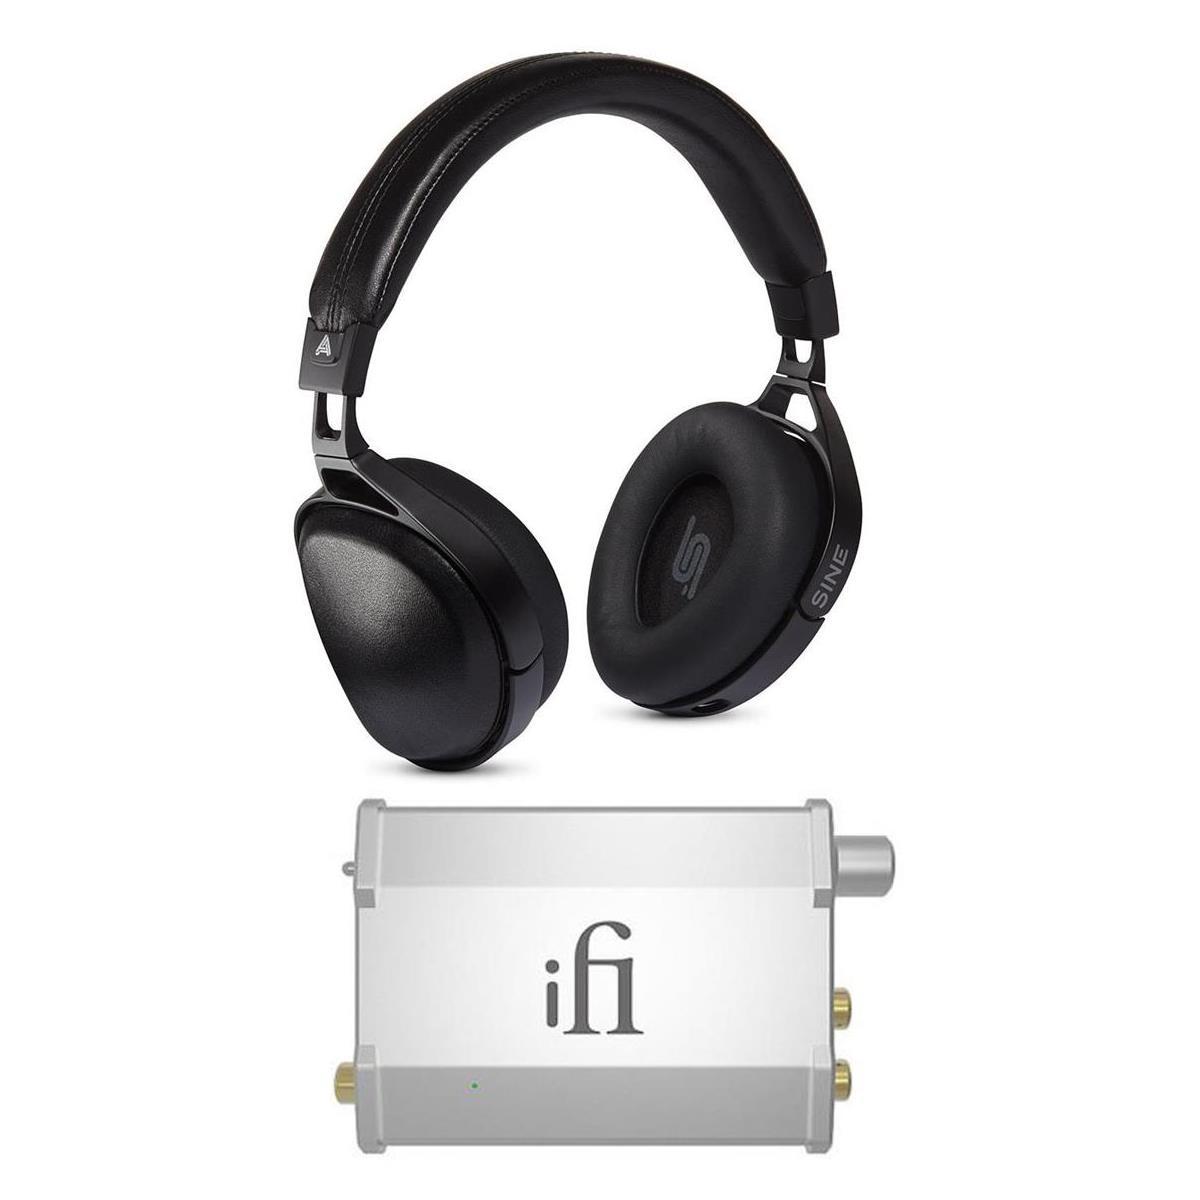 Audeze SINE On-Ear Closed-Back Headphones + iFi Nano-iDSD Amp / Dac $449 + free shipping